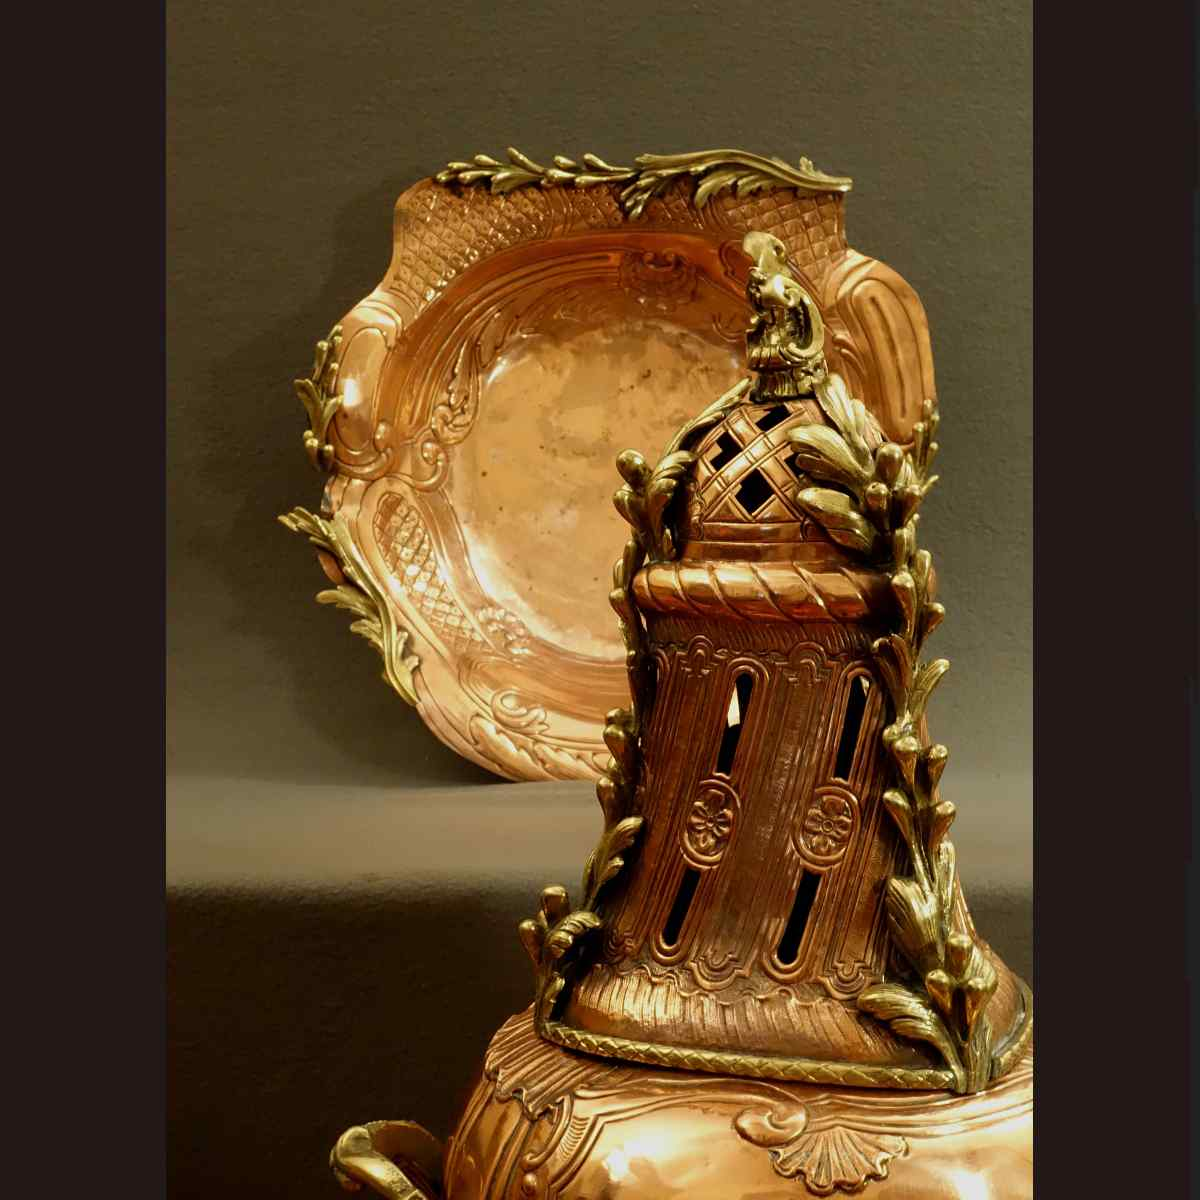 Rare Water Dispenser - Perfume Burner Regency Era